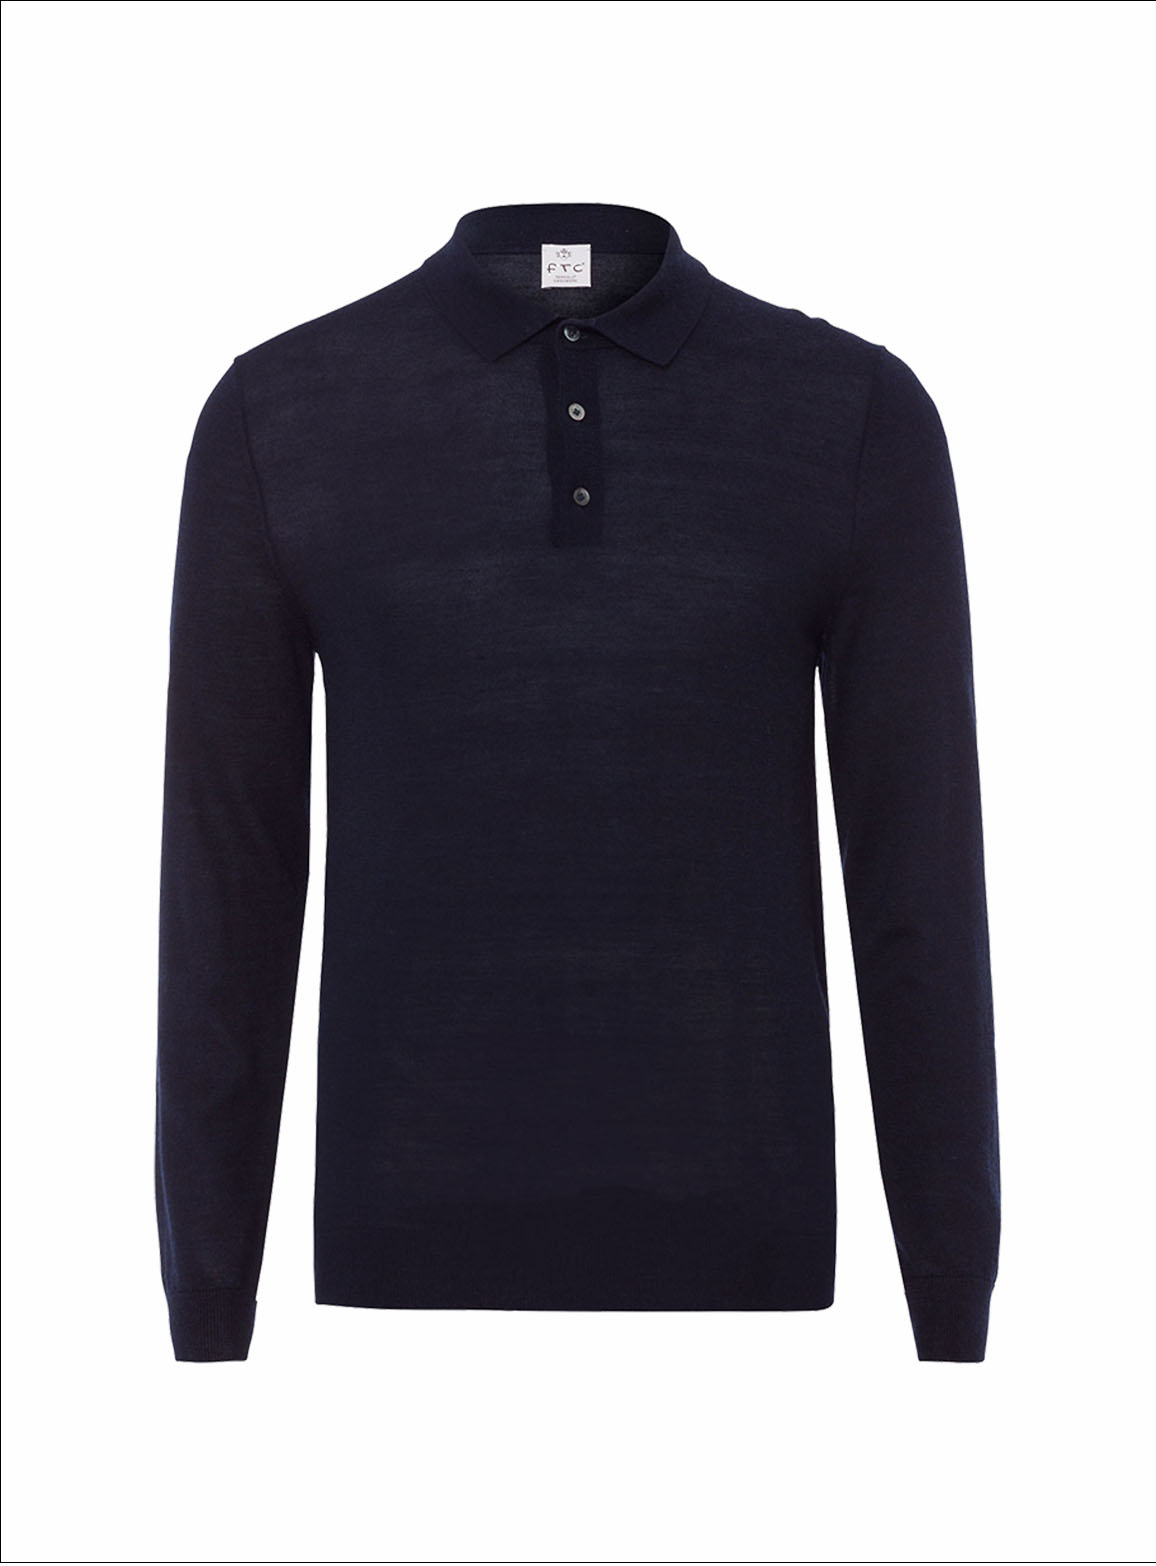 Longarm Poloshirt